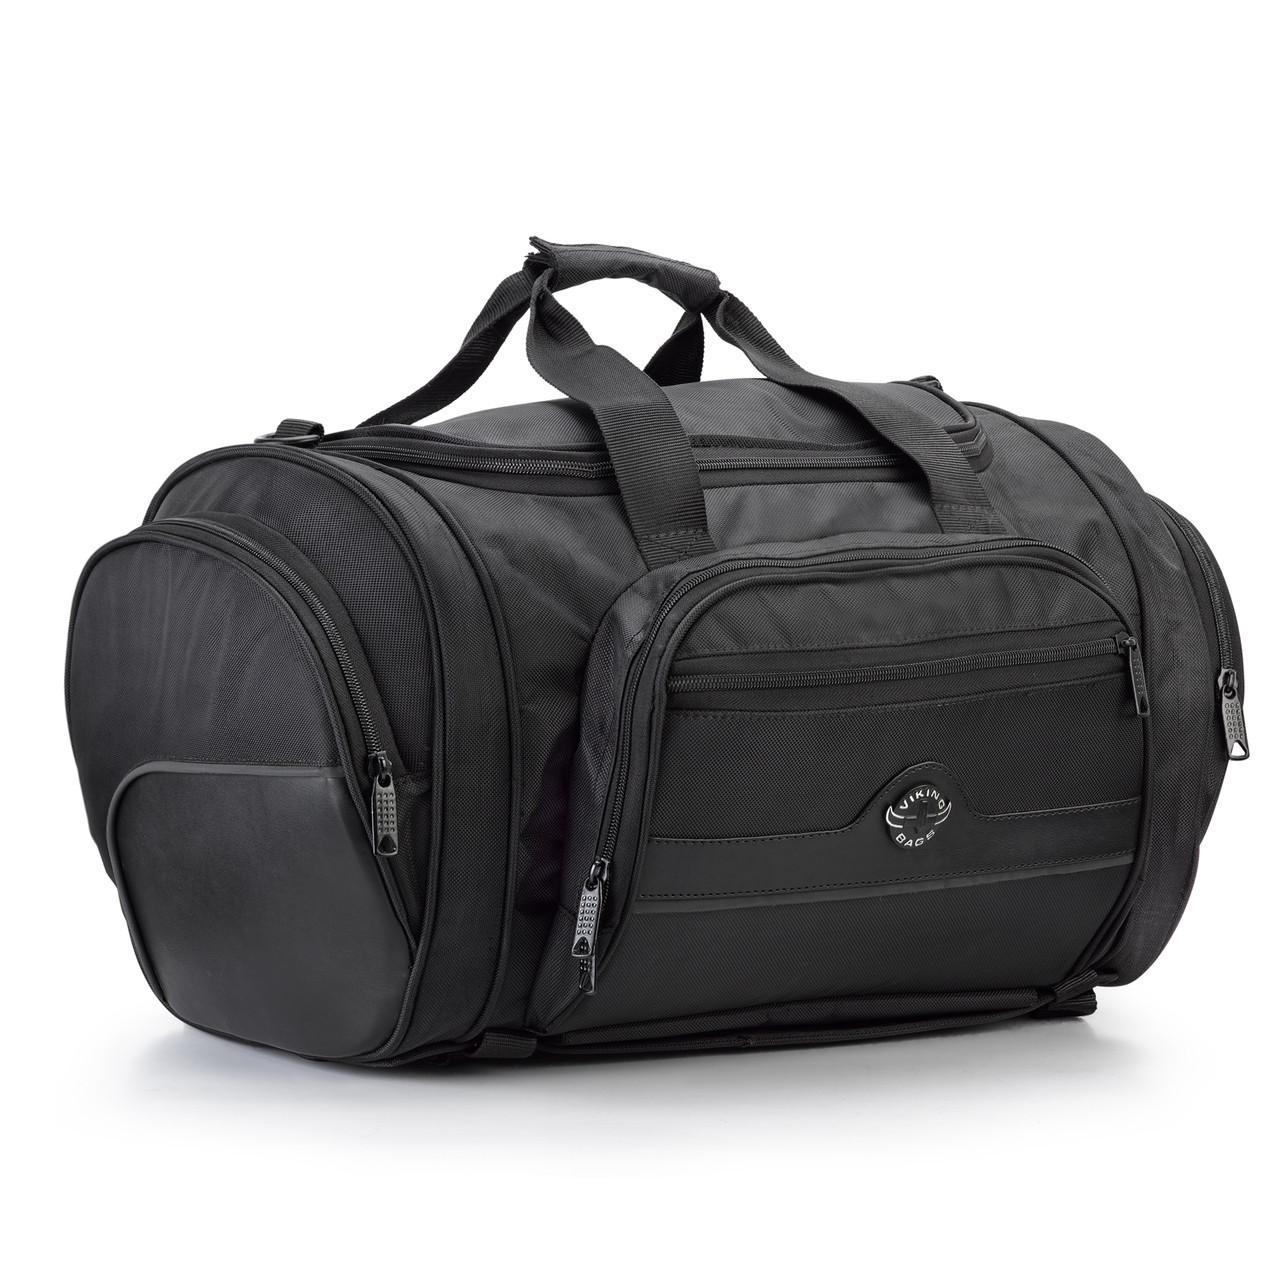 Vikingbags Cruise Motorcycle Roll Bag